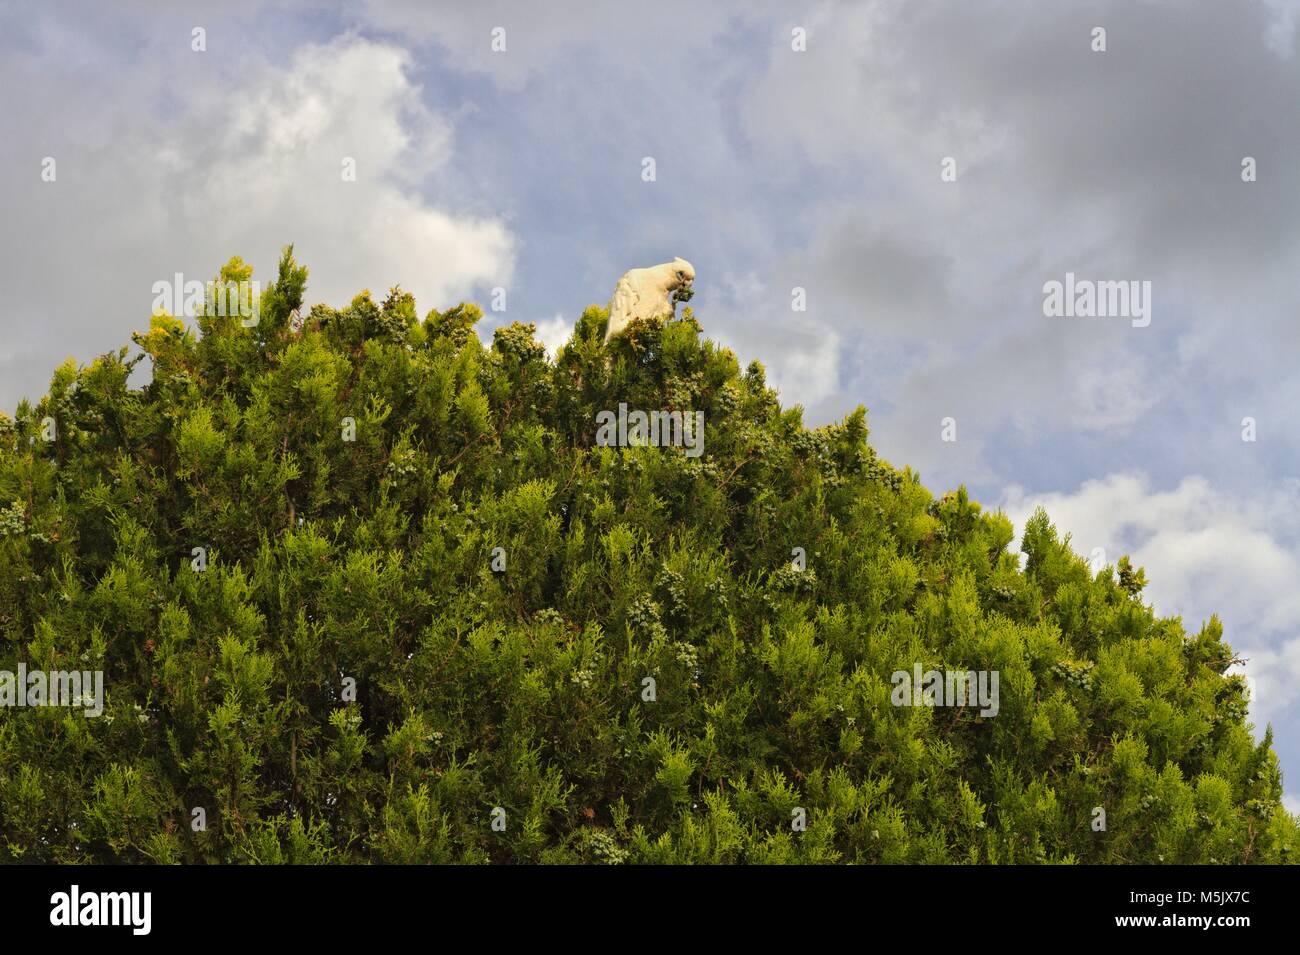 Little Corella, an Australian parrot, feeding on top of a tree, against a cloudy sky. Stock Photo